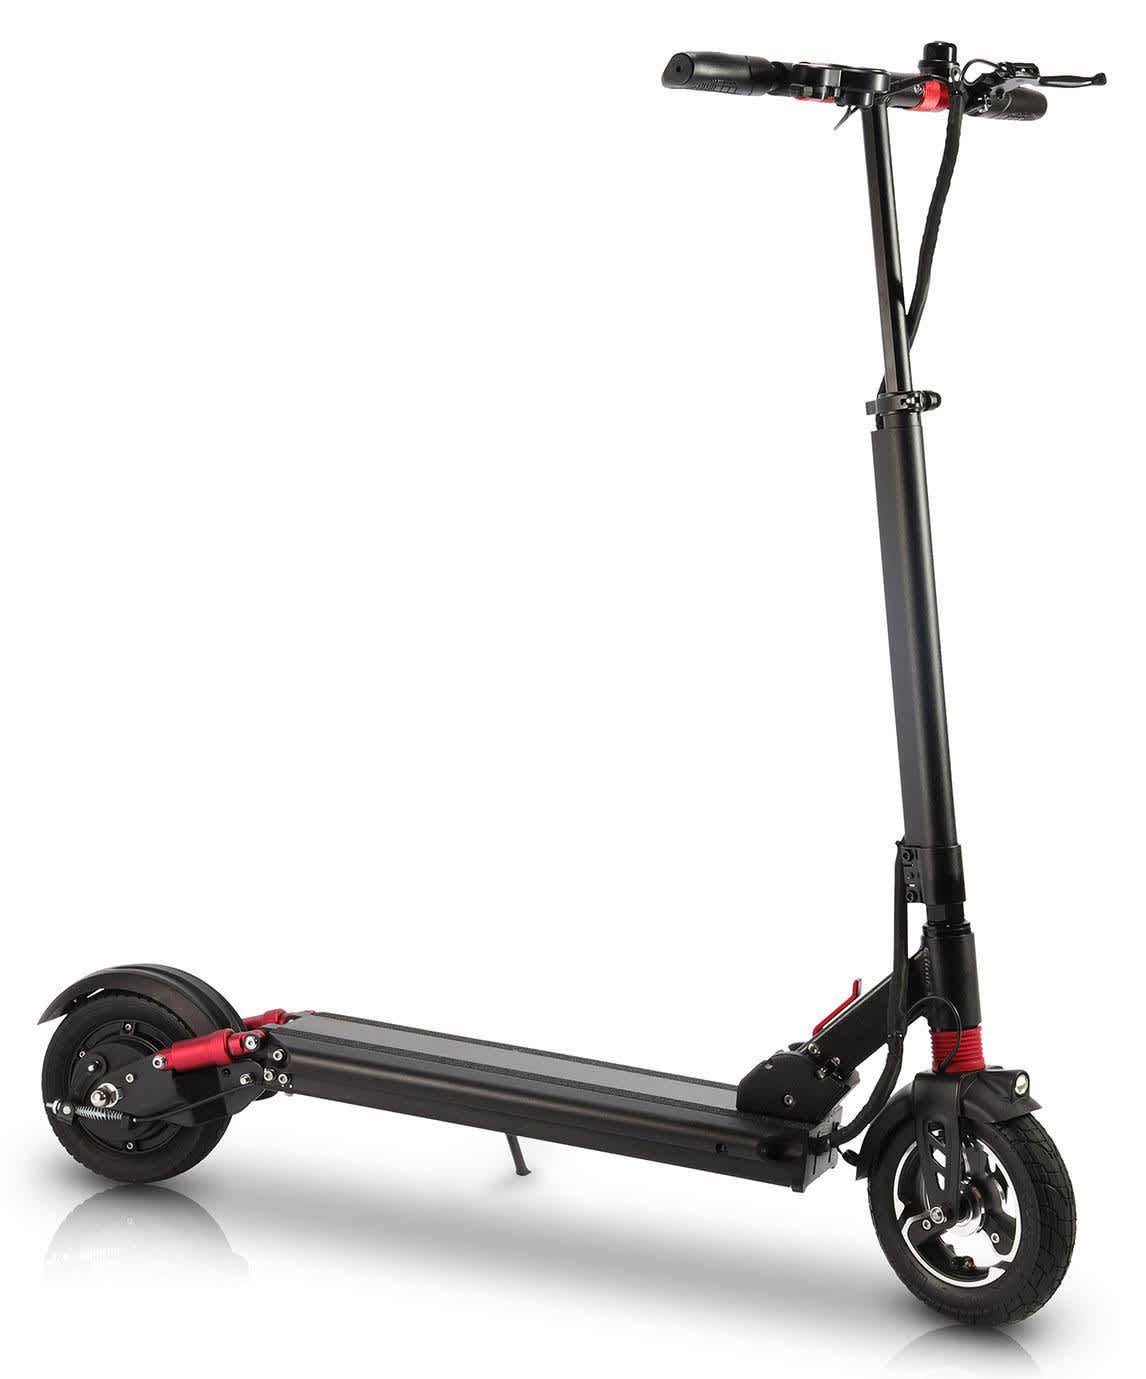 Plug City 500W Folding Electric Scooter